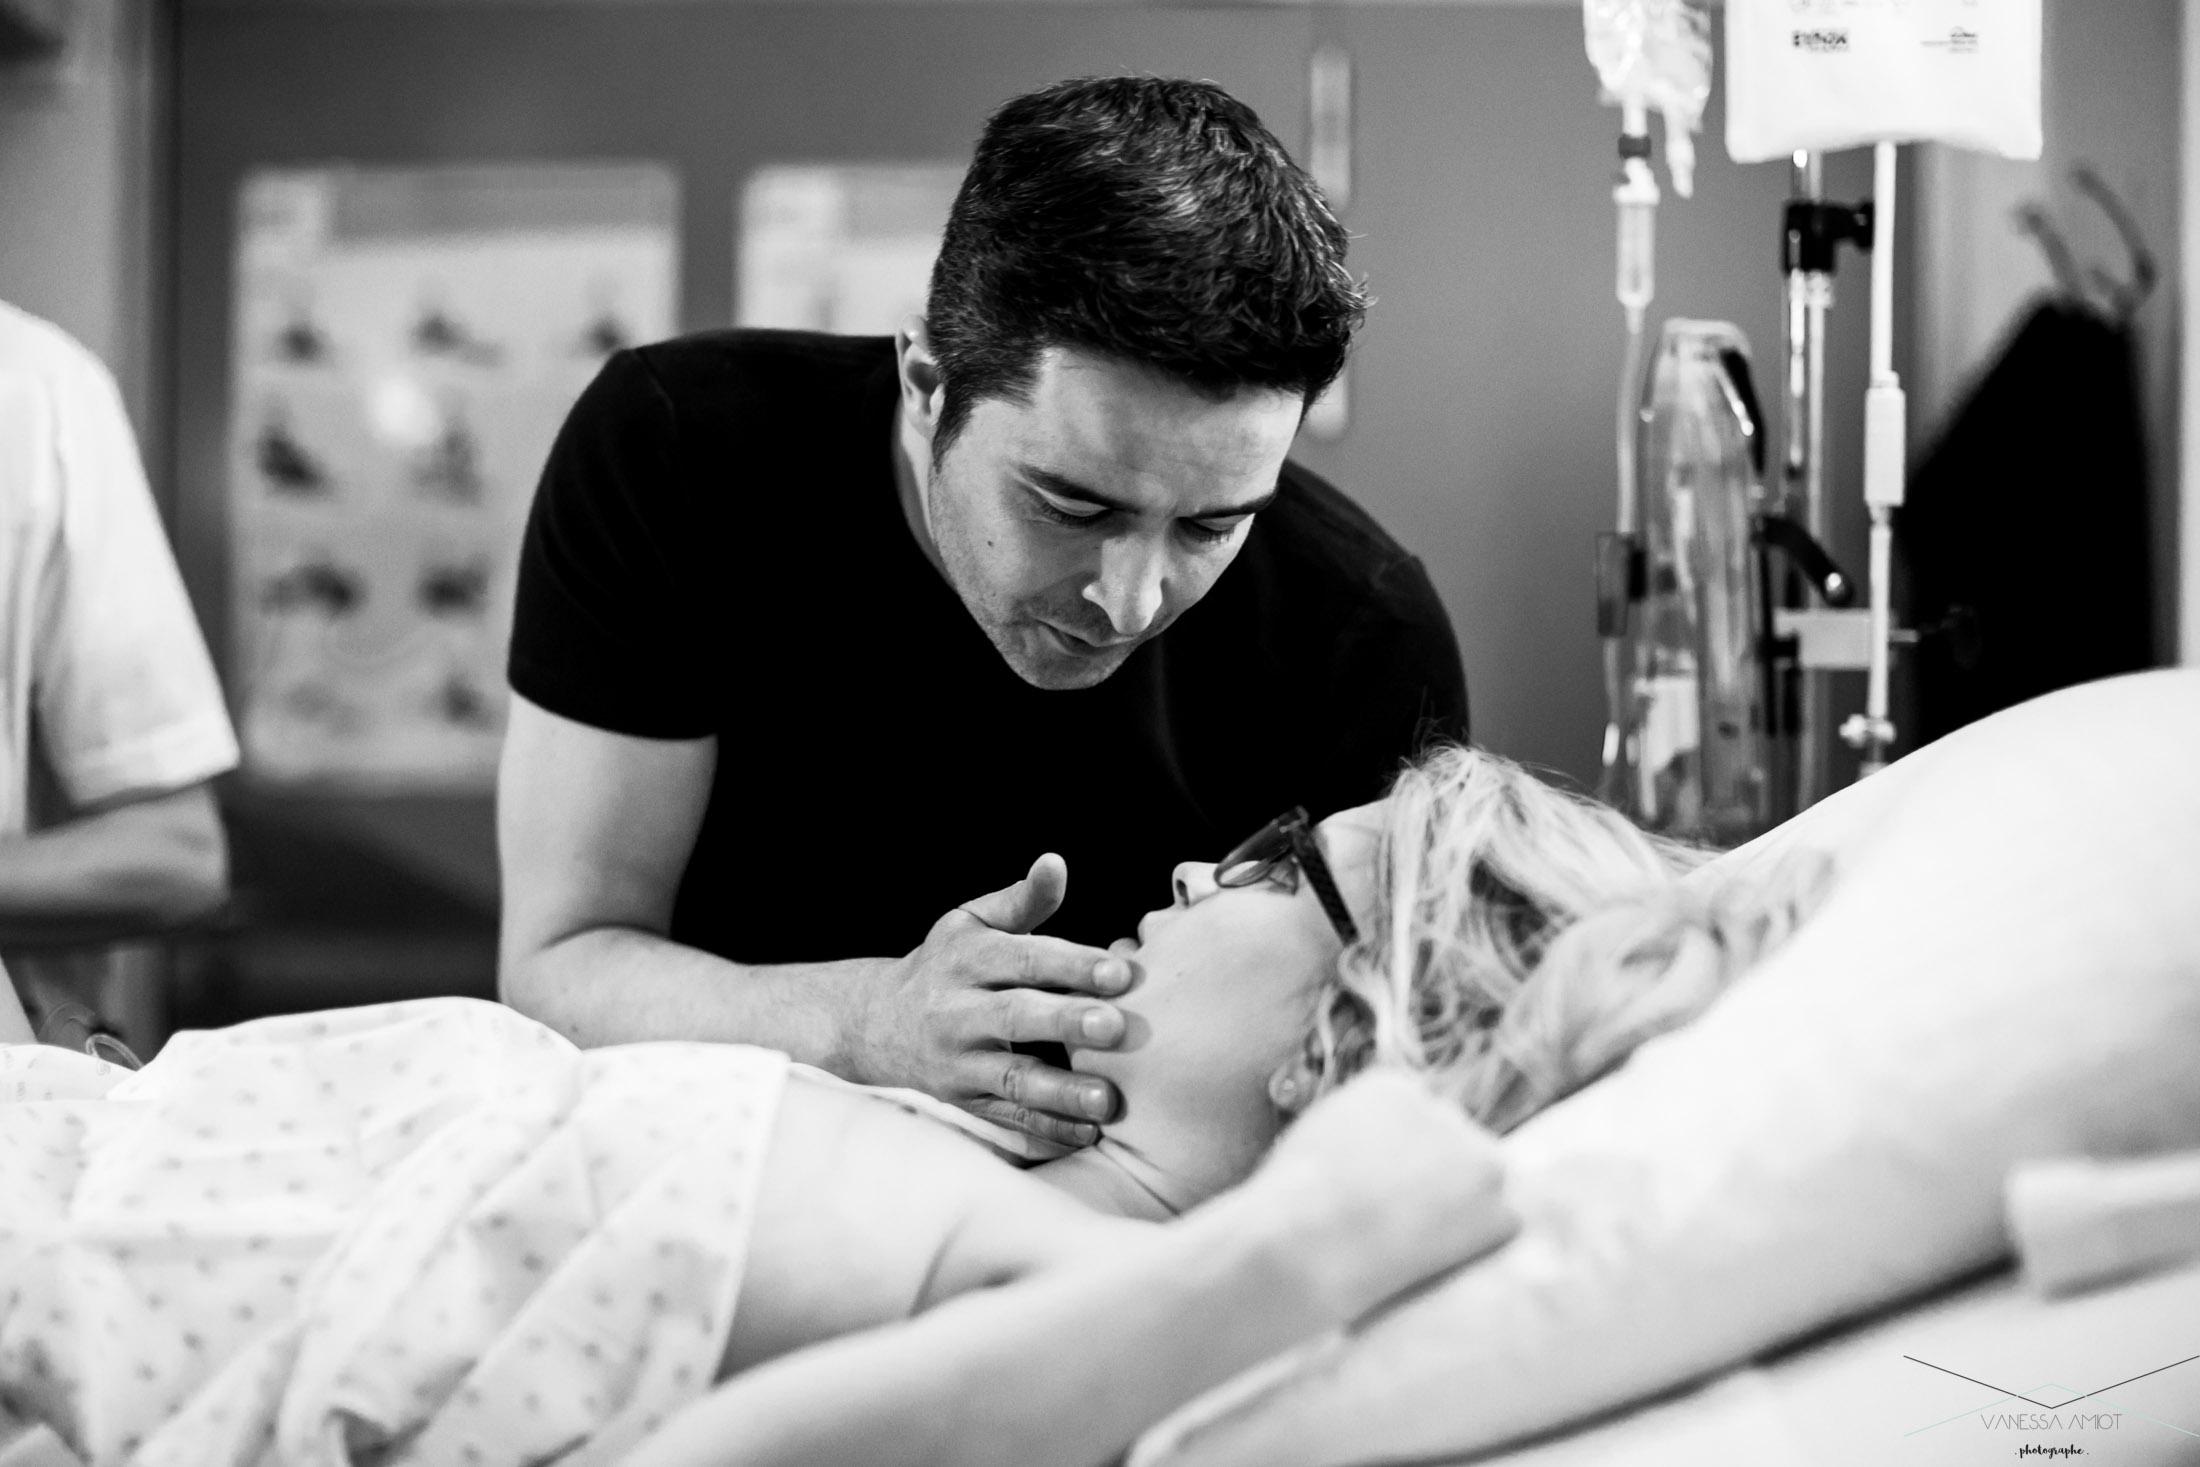 vanessa amiot photographe accouchement à domicile - photographe accouchement thonon -